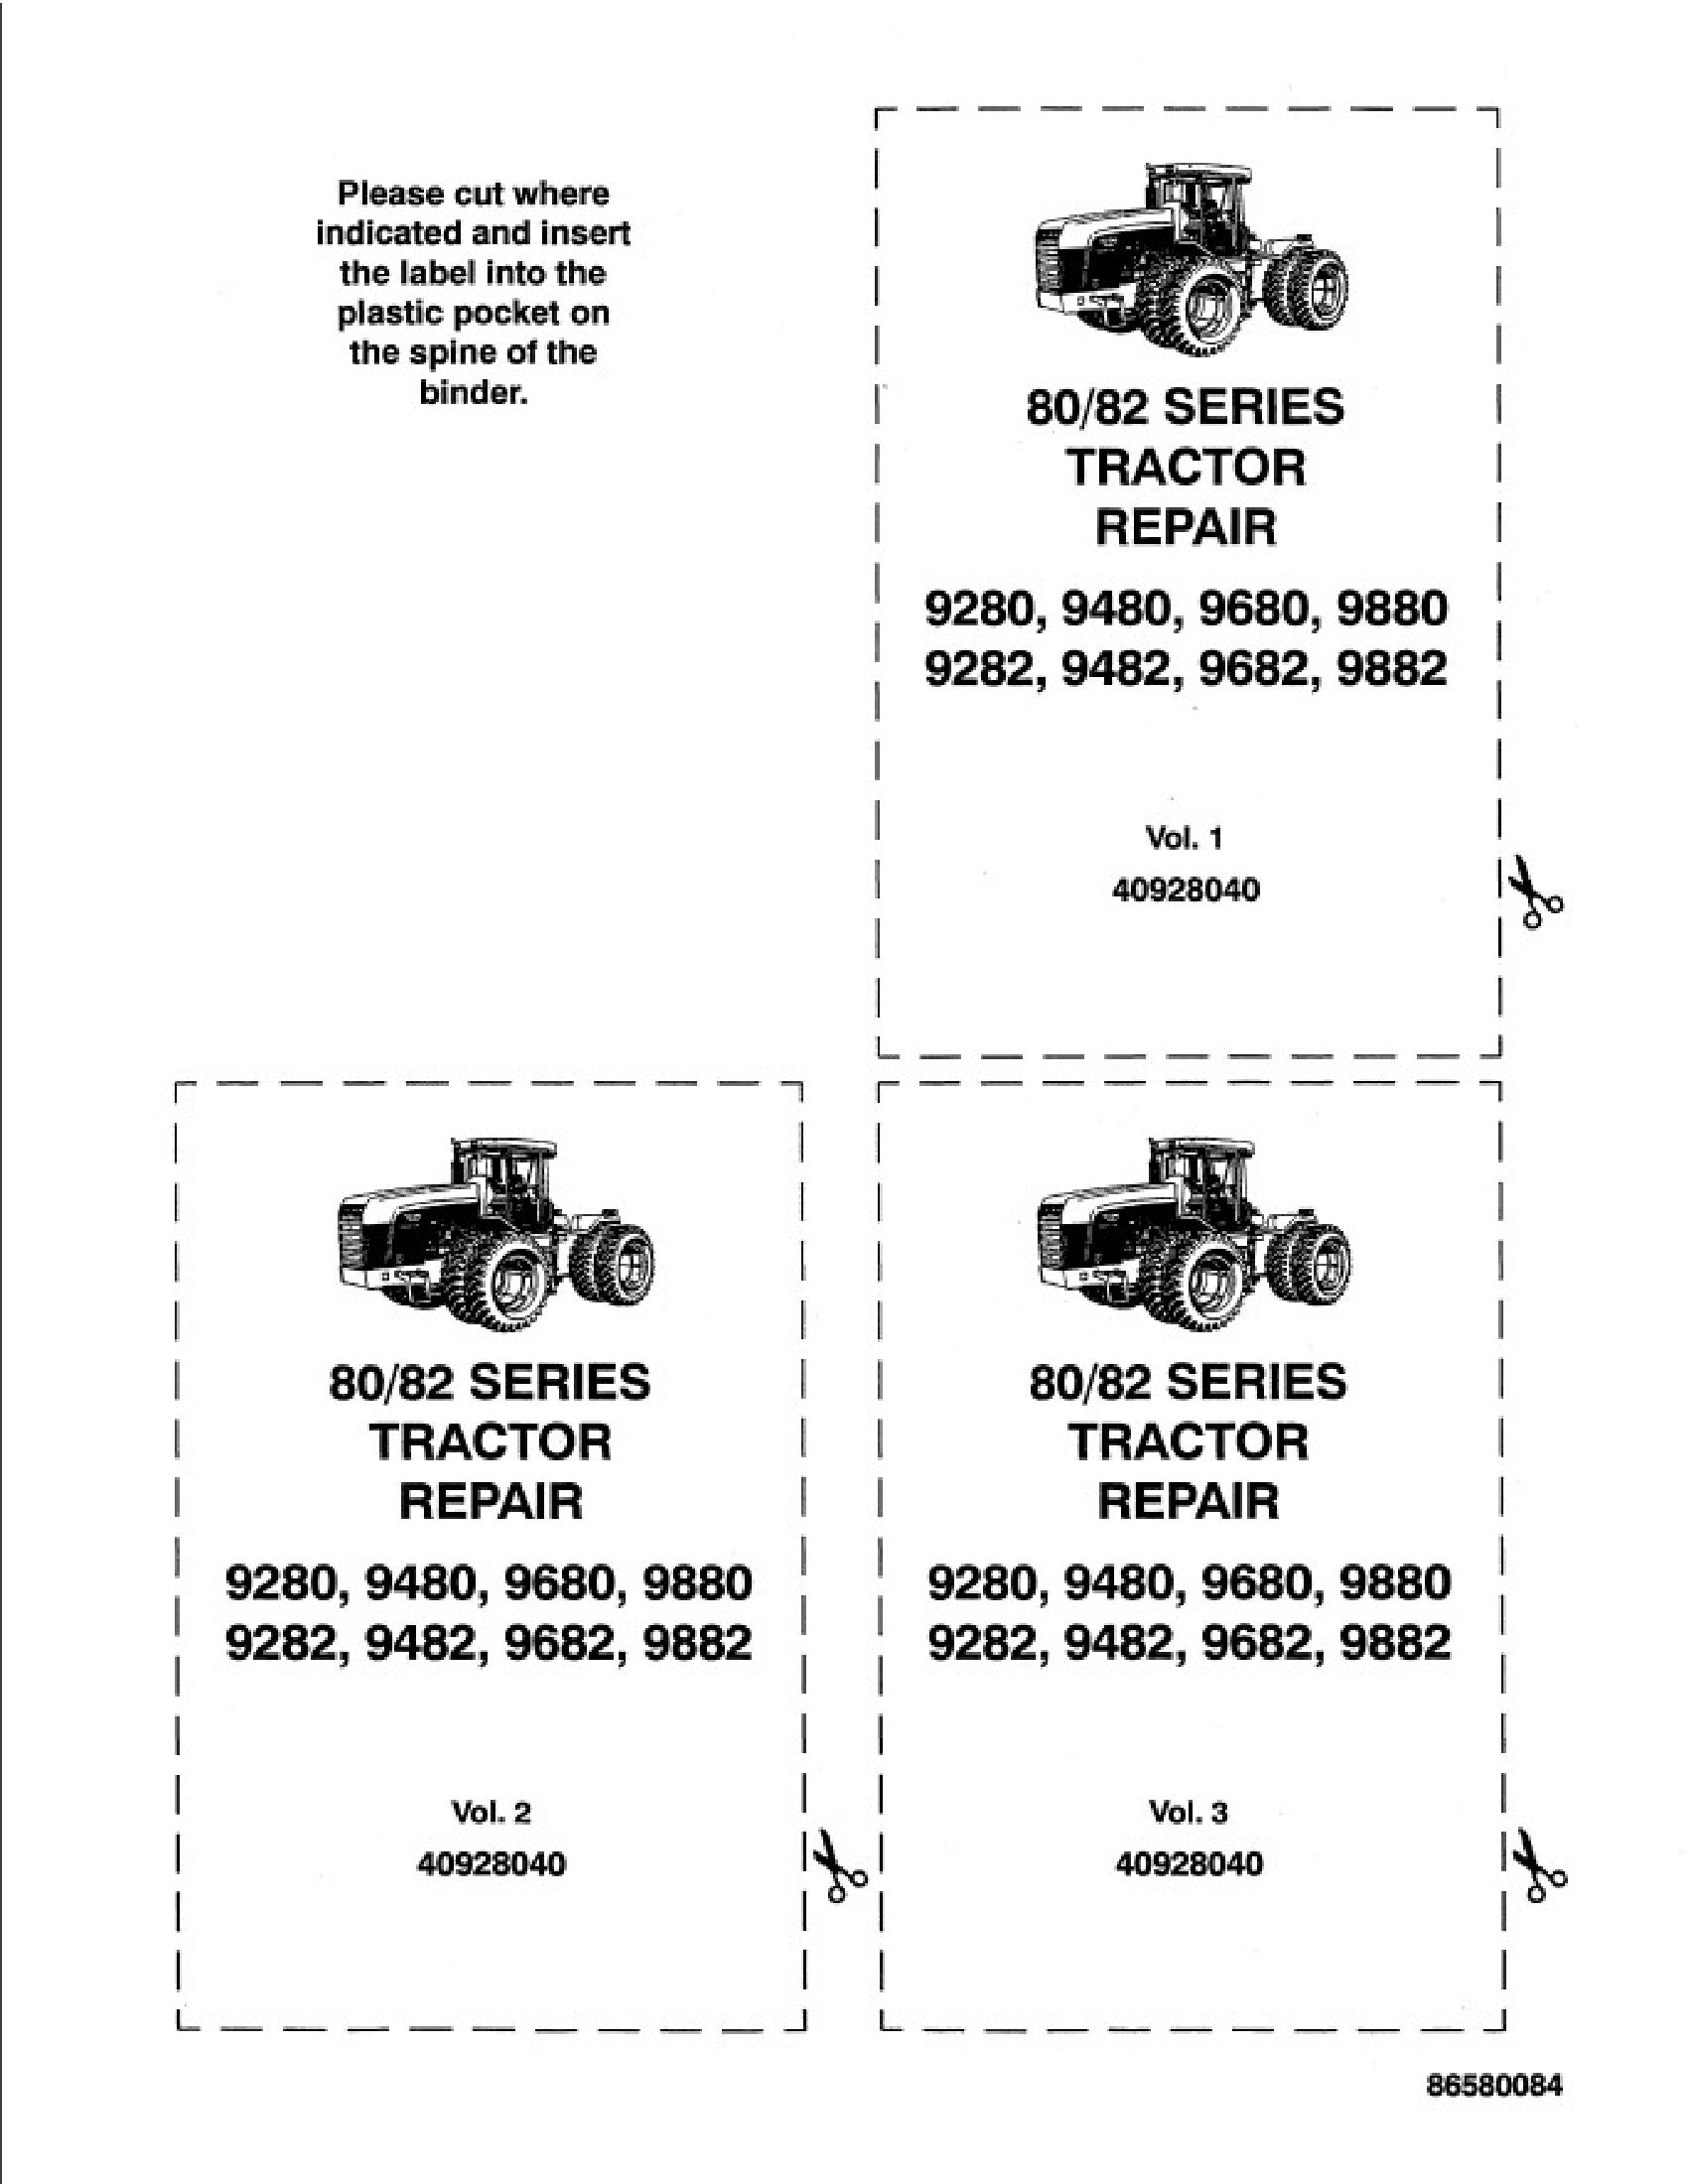 New Holland 80 Series Tractor Manual In 2020 Tractors New Holland Repair Manuals